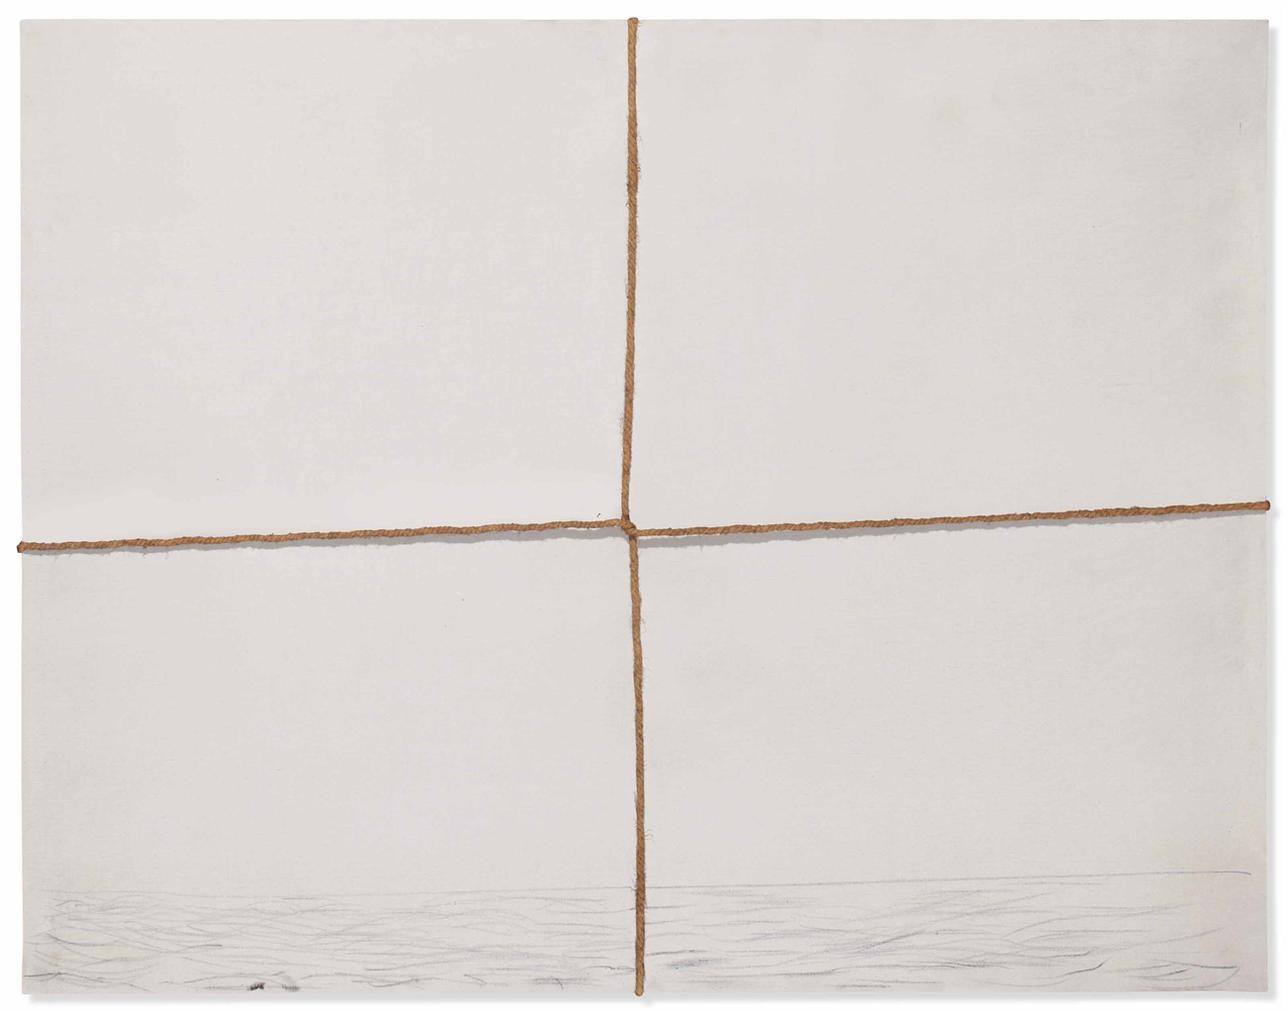 Antoni Tapies-Tela Atada (Tied Canvas)-1969